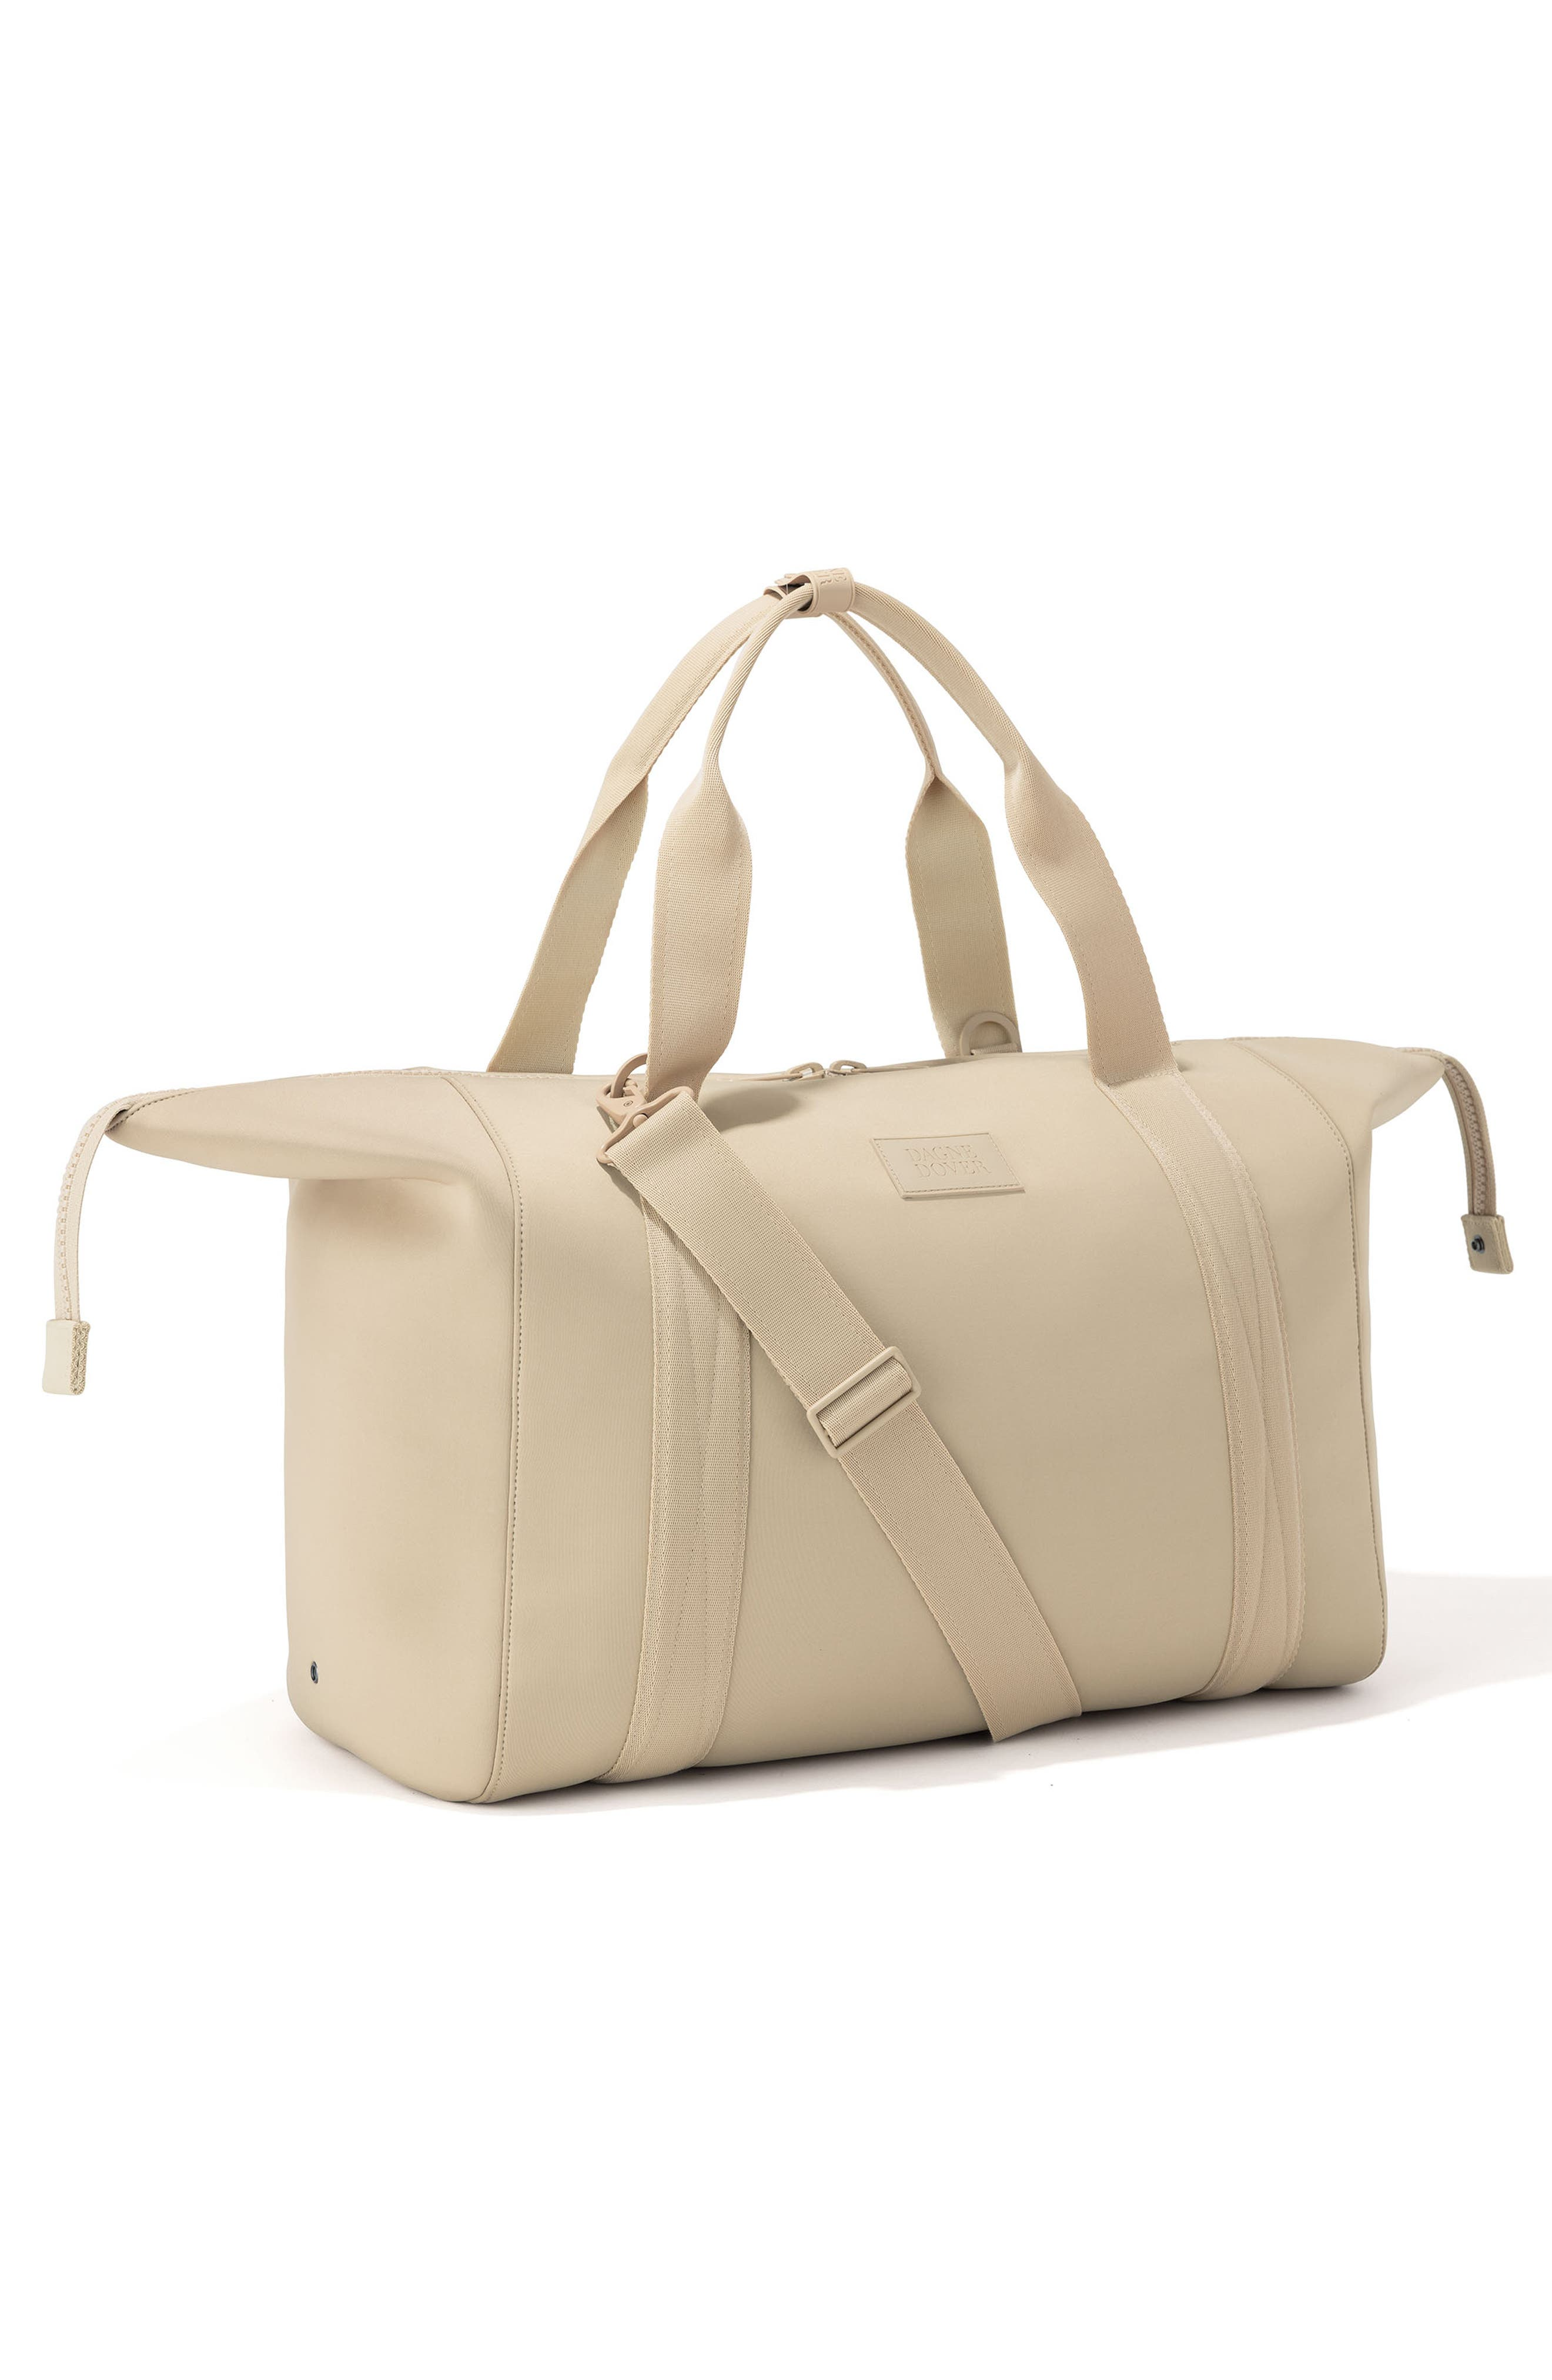 DAGNE DOVER, XL Landon Carryall Duffel Bag, Alternate thumbnail 5, color, ALMOND LATTE